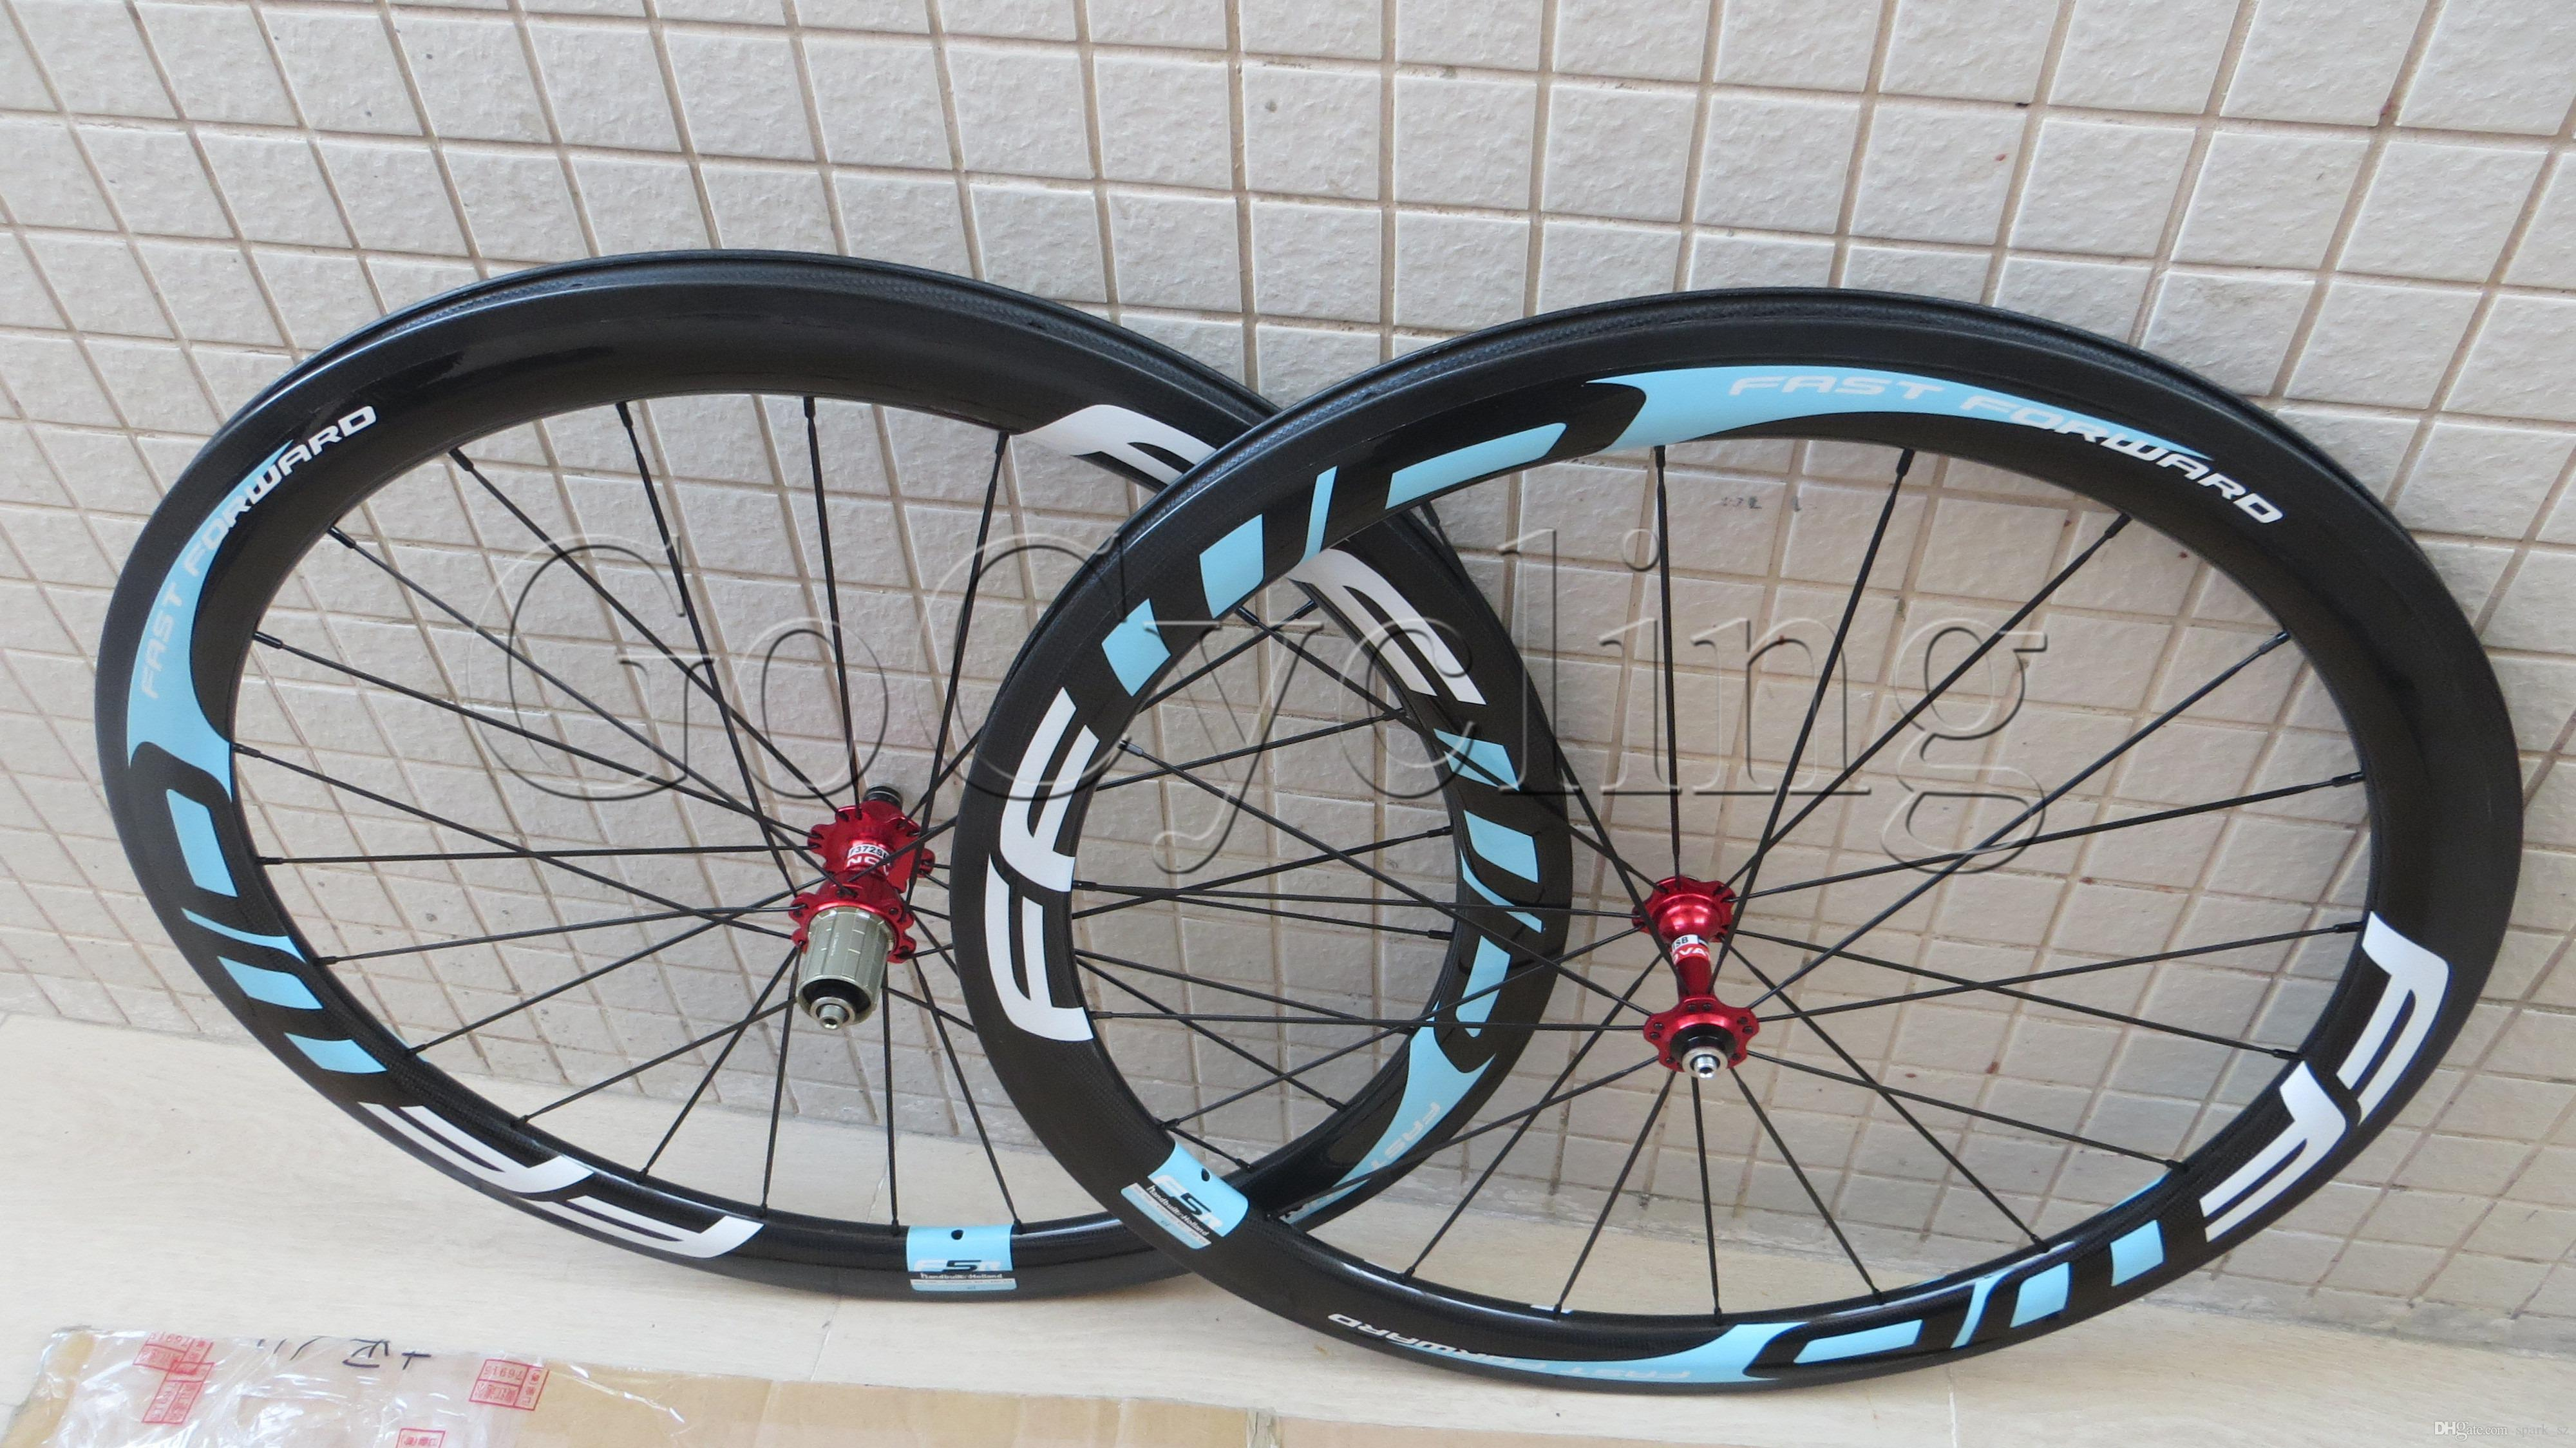 FFWD fast forward F5R carbon bicycle wheels 50mm clincher tubular road cycling bike 700C wheelset white blue 3k glossy